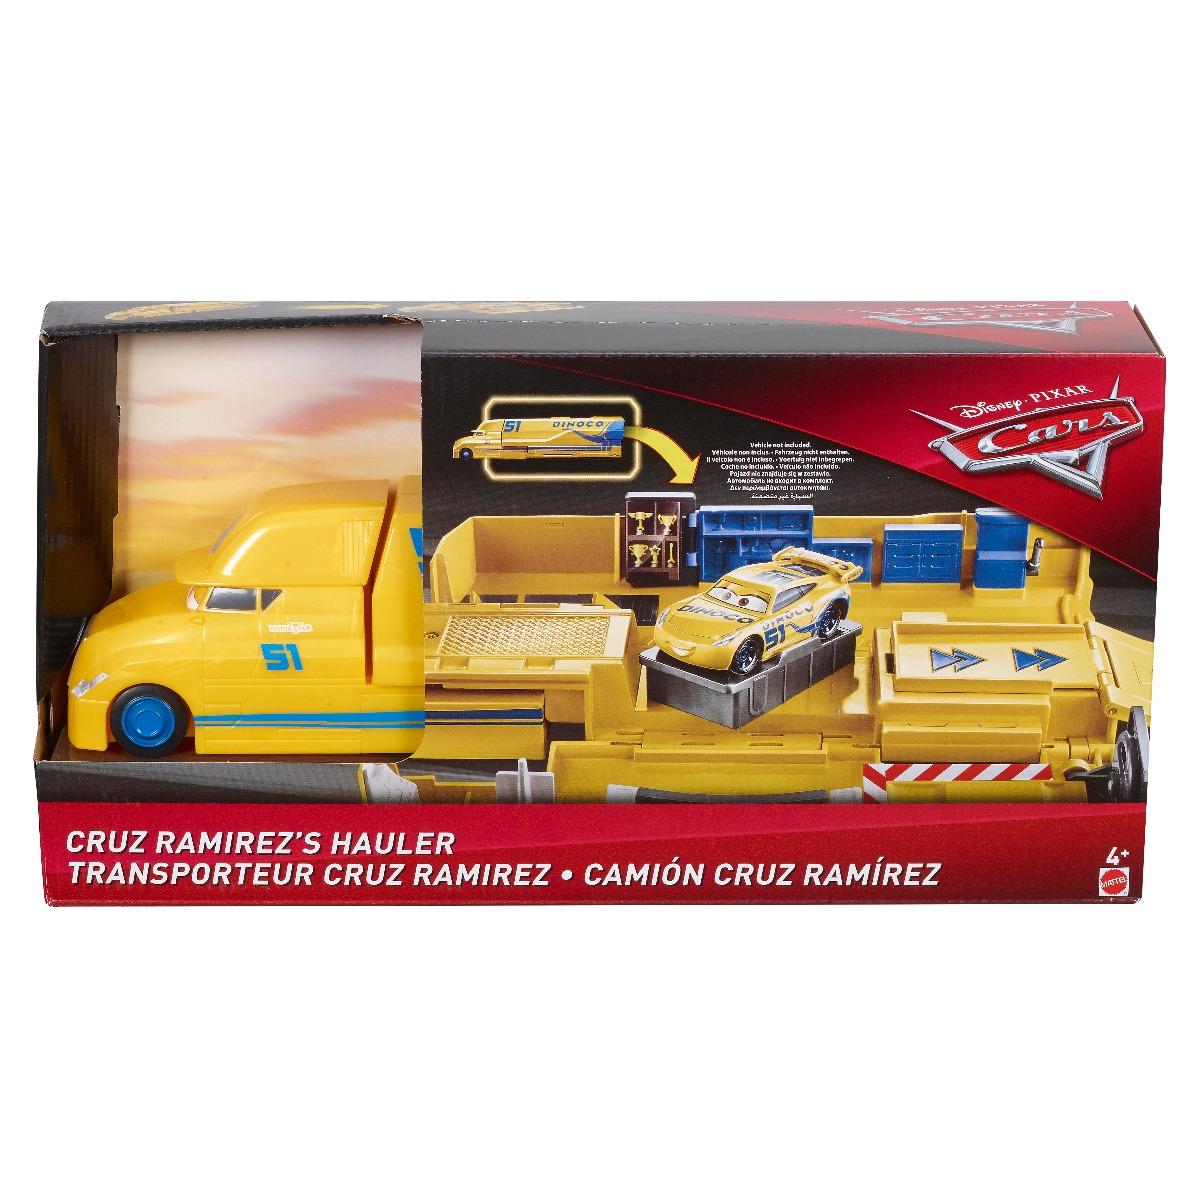 Set de joaca Mega Transportatorul Disney Cars, Cruz Ramirez FLK11